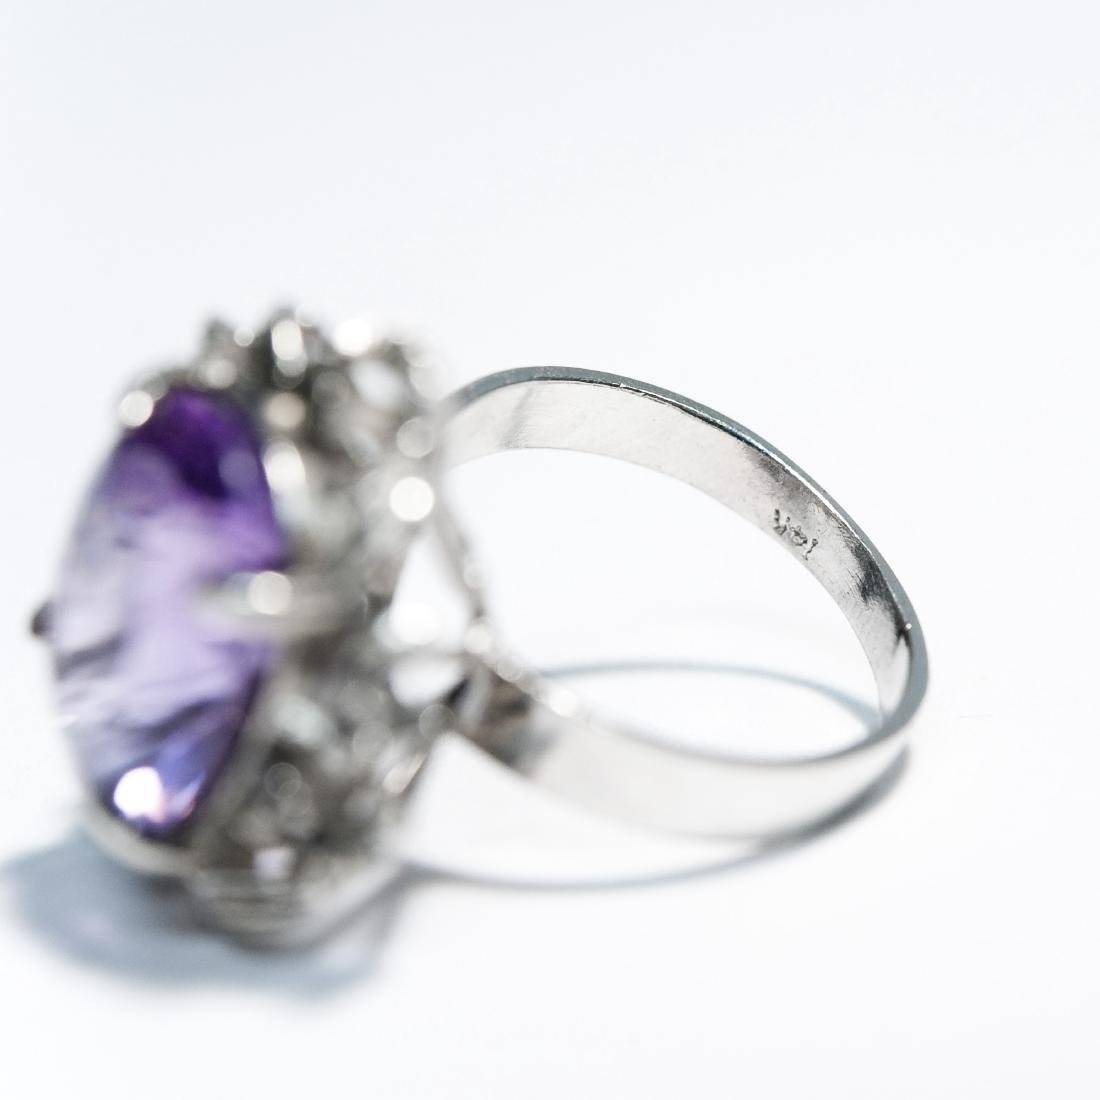 14K White Gold & Amethyst Ring. - 4